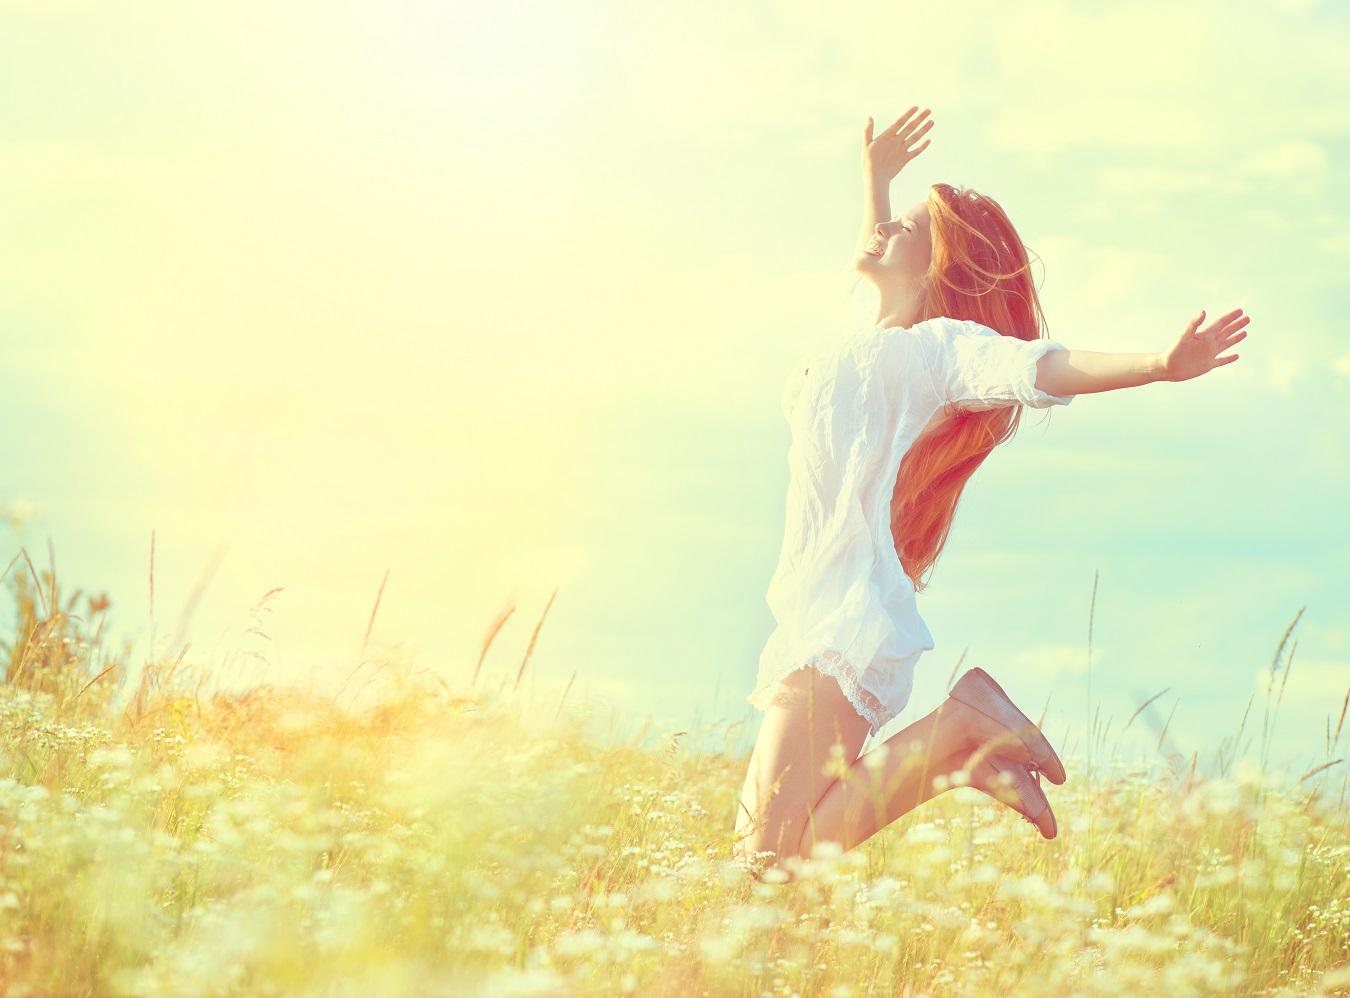 Frau springt vor Freude hoch